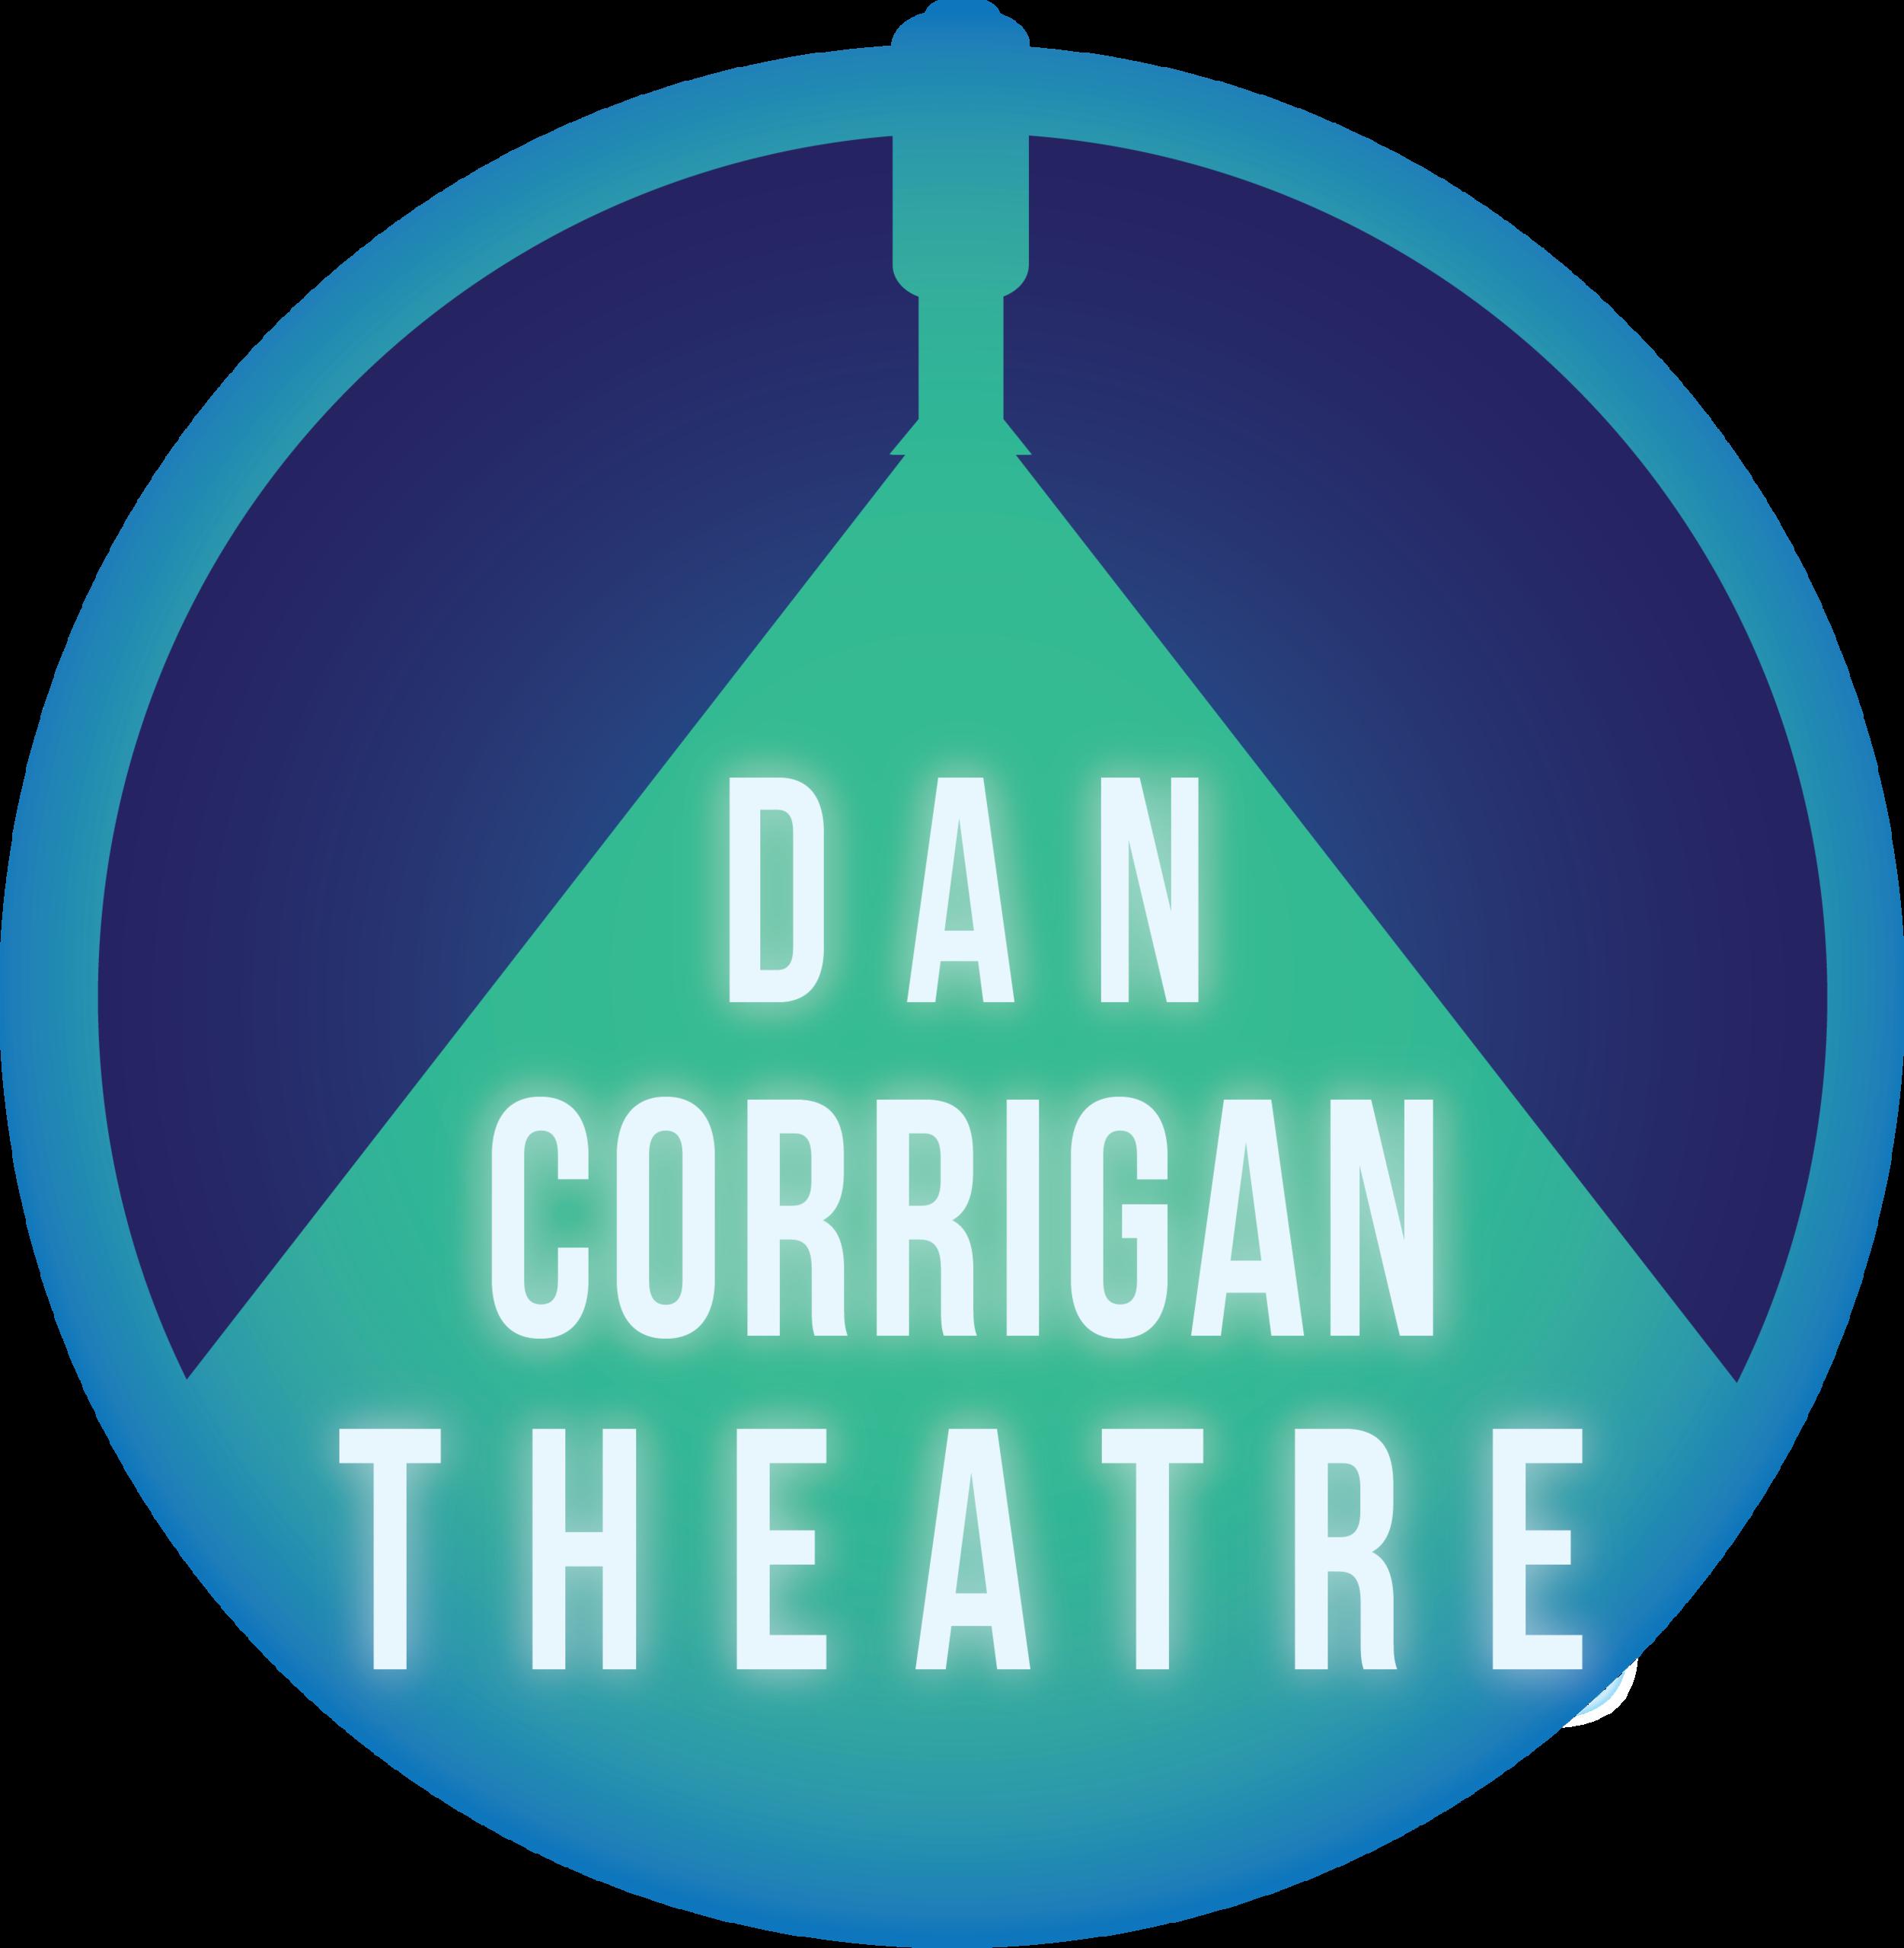 Dan Corrigan Theatre